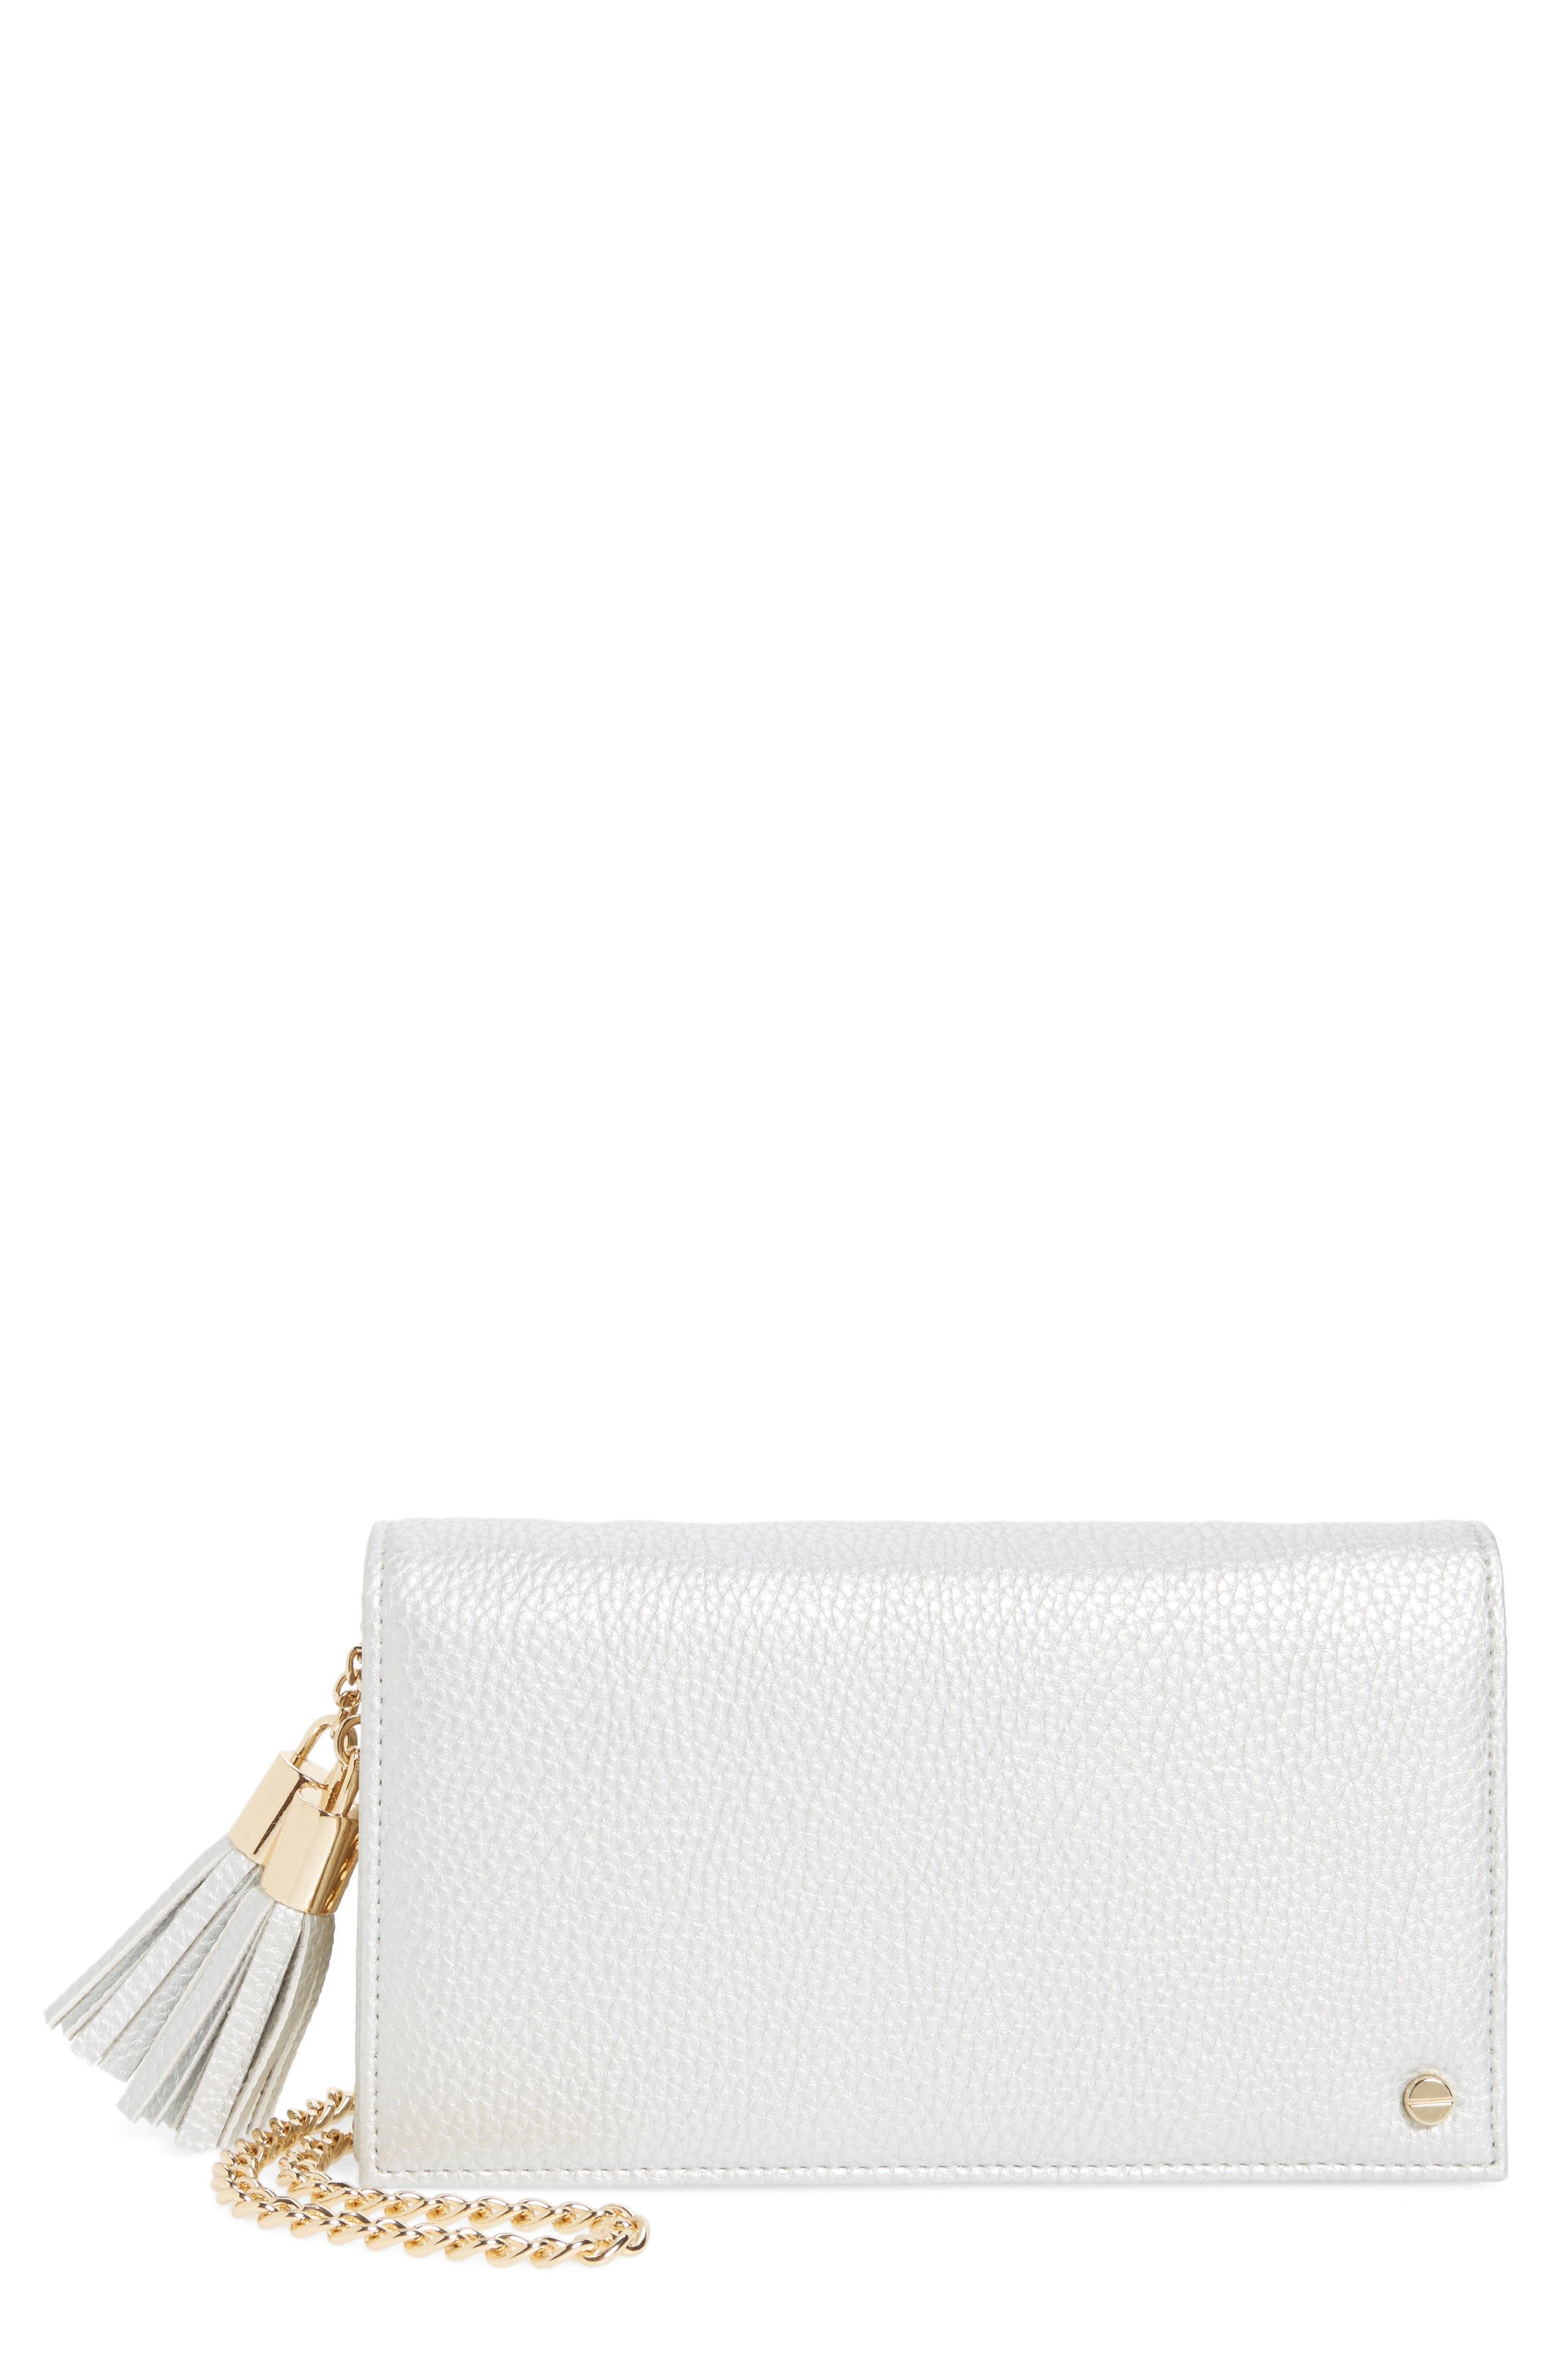 Mali + Lili Tassel Convertible Vegan Leather Clutch,                         Main,                         color, Silver